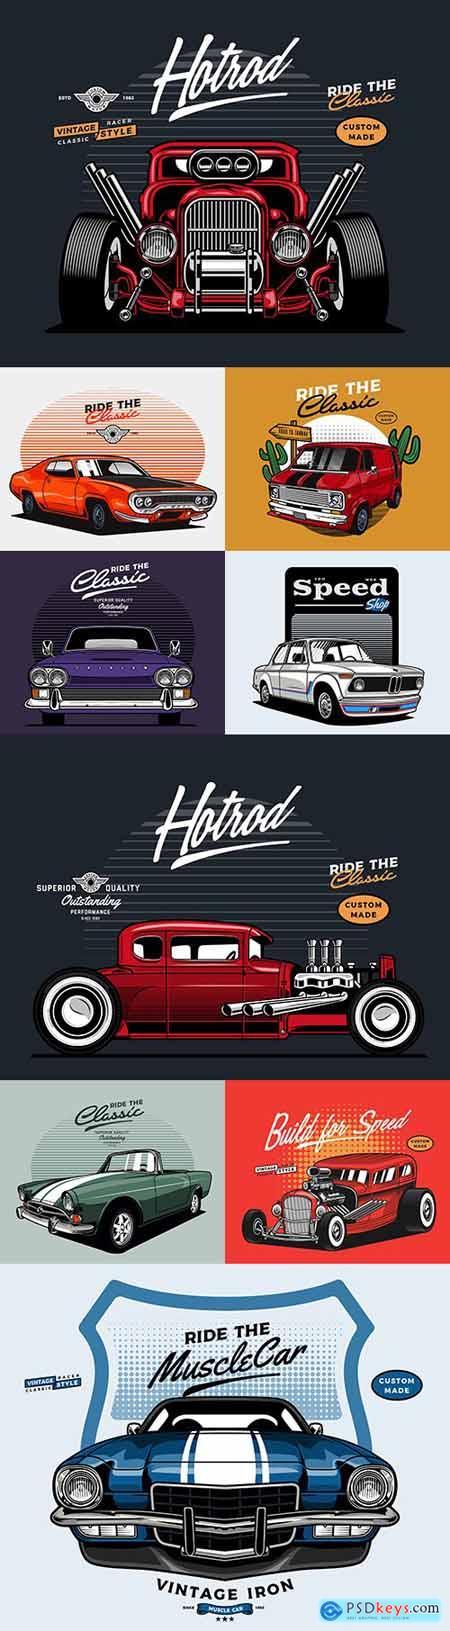 Retro car brand collection illustrations